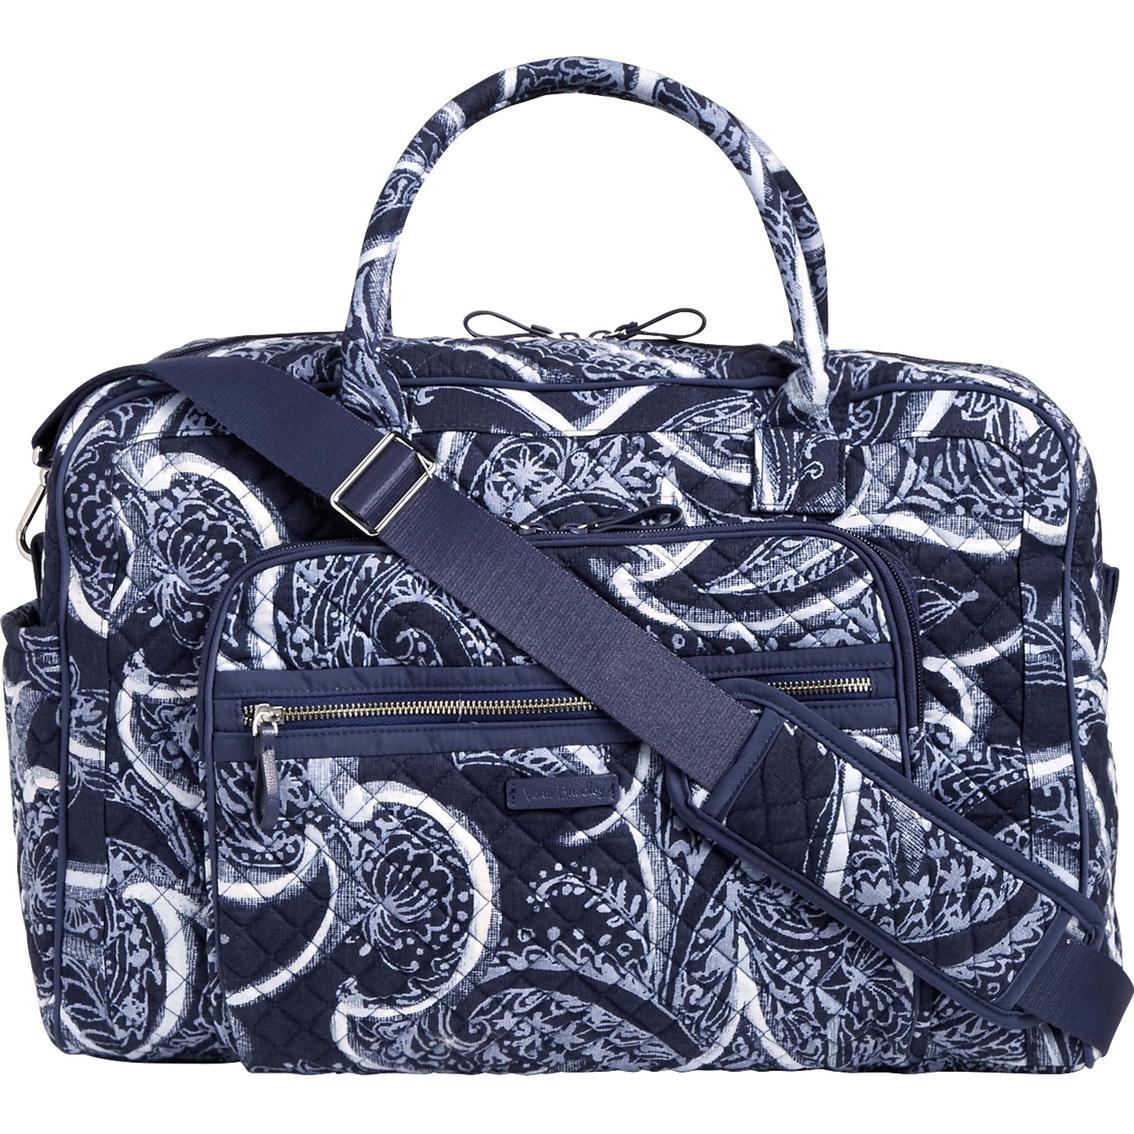 Vera Bradley Iconic Weekender Travel Bag Indio Luggage